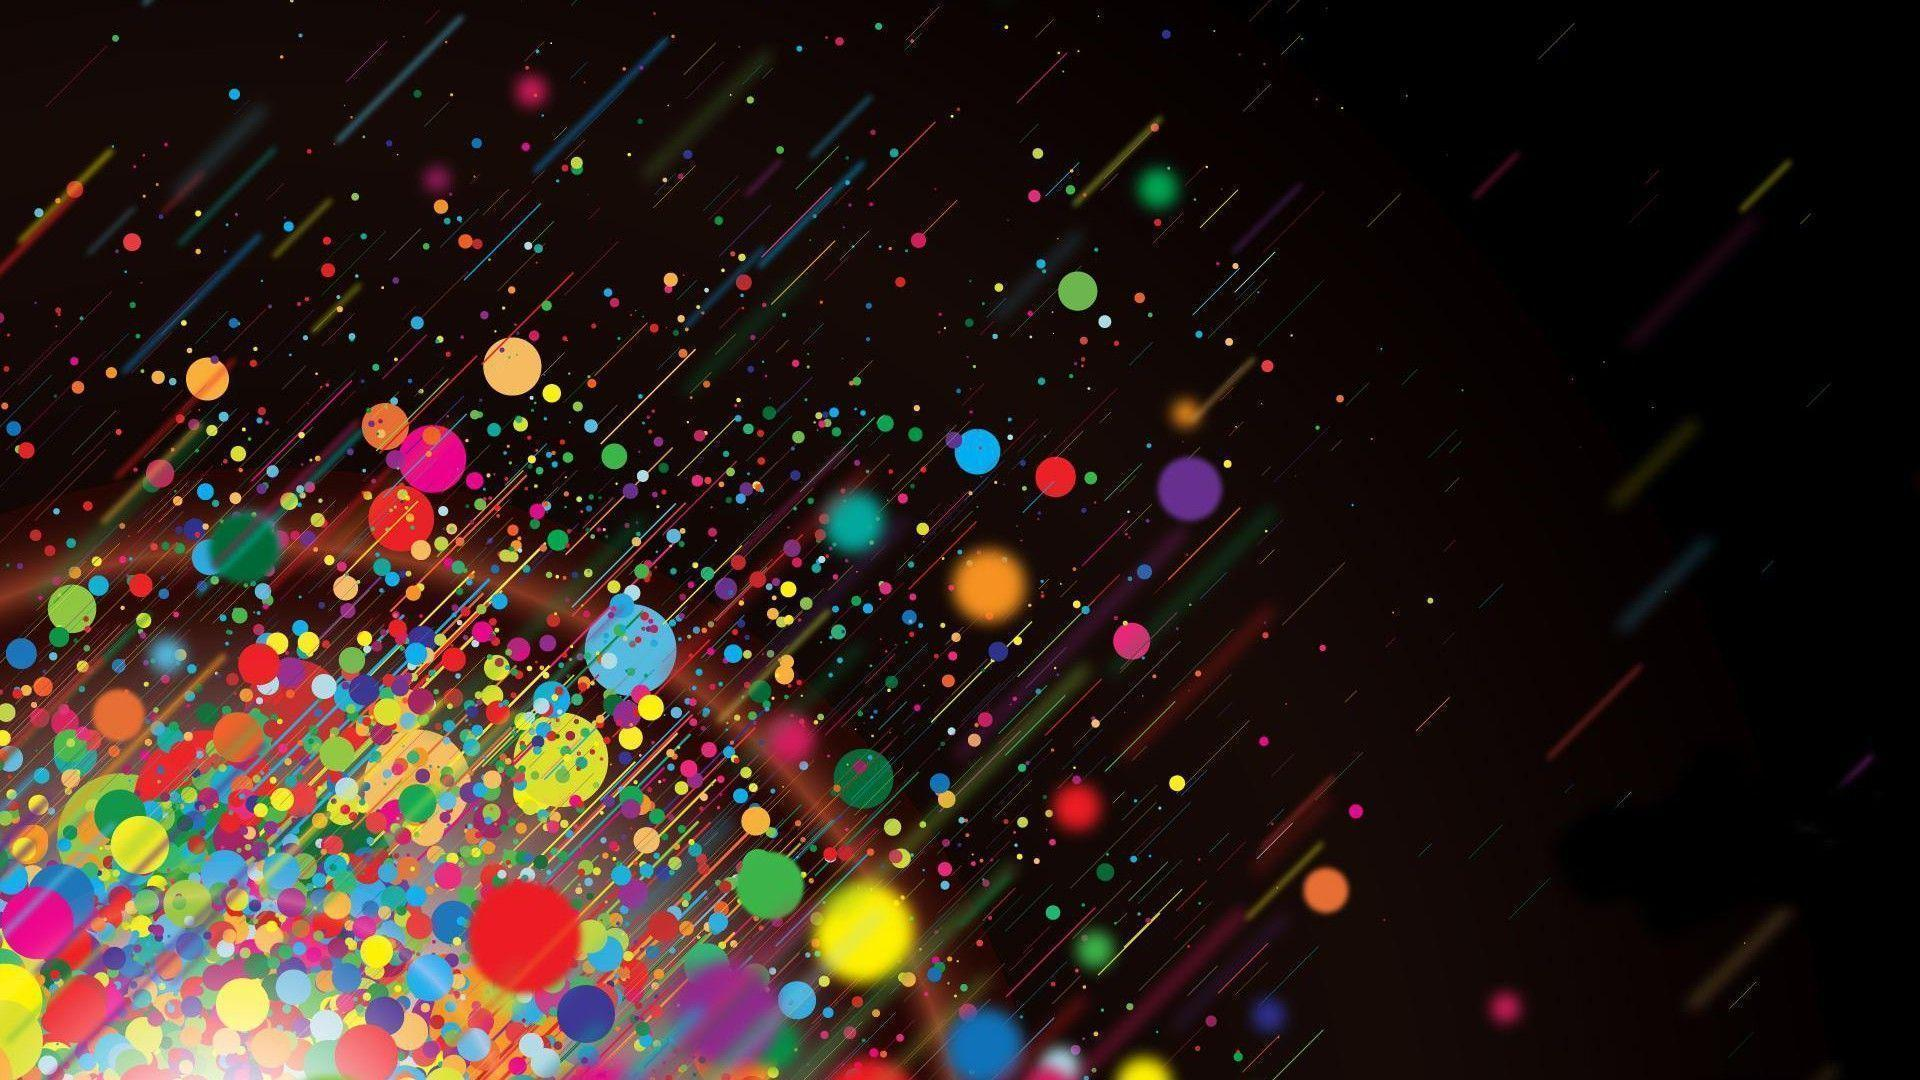 colourful hd 1080p wallpaper - photo #11